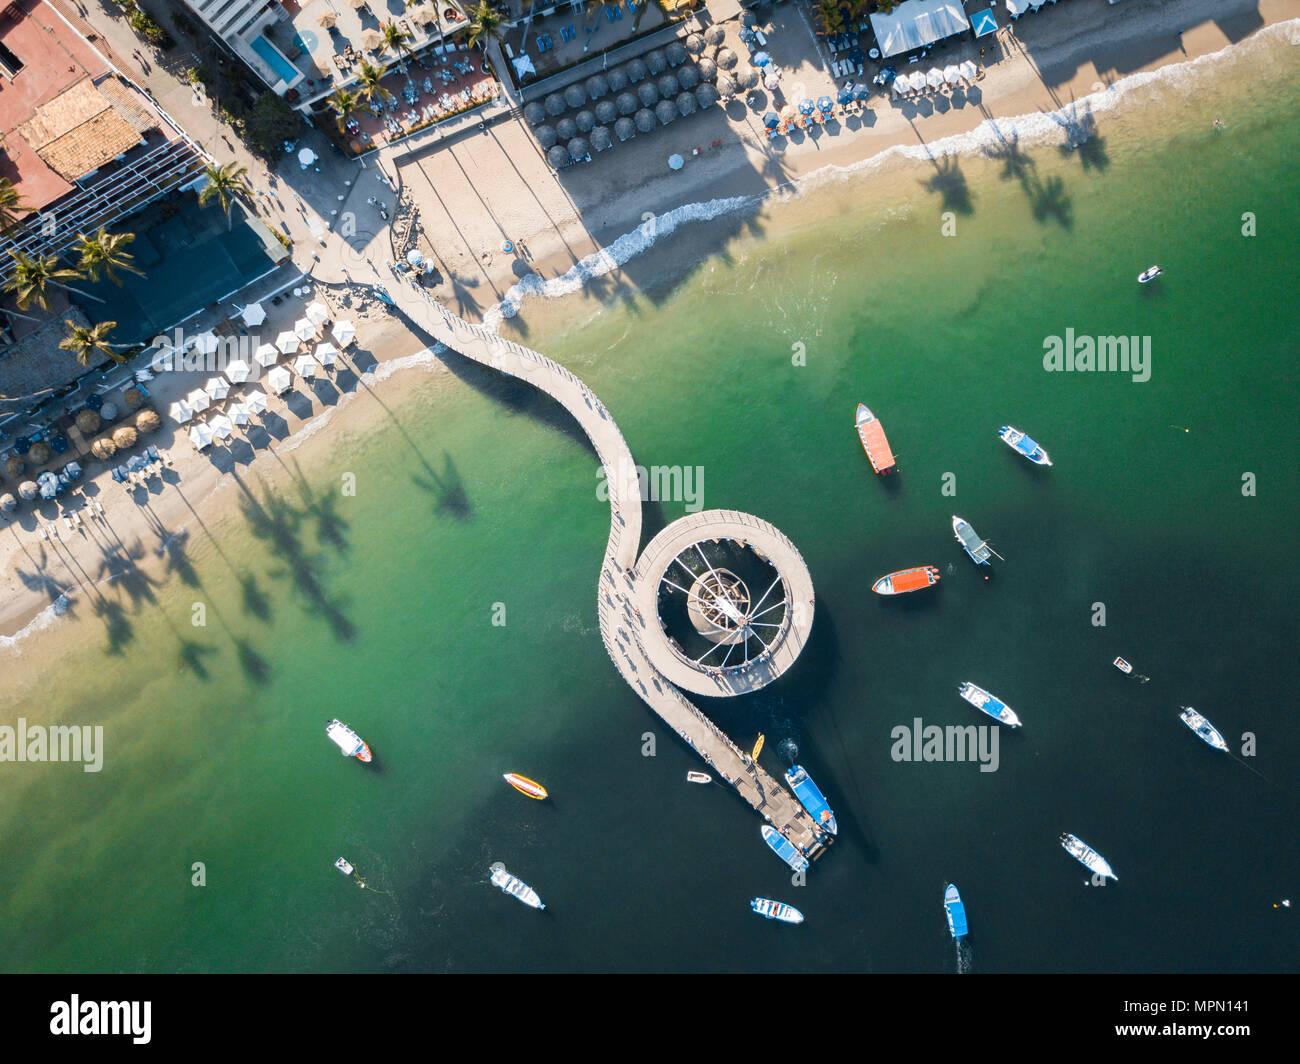 Mexiko, Jalisco, Luftaufnahme am Strand Los Muertos und Pier in Puerto Vallarta Stockbild